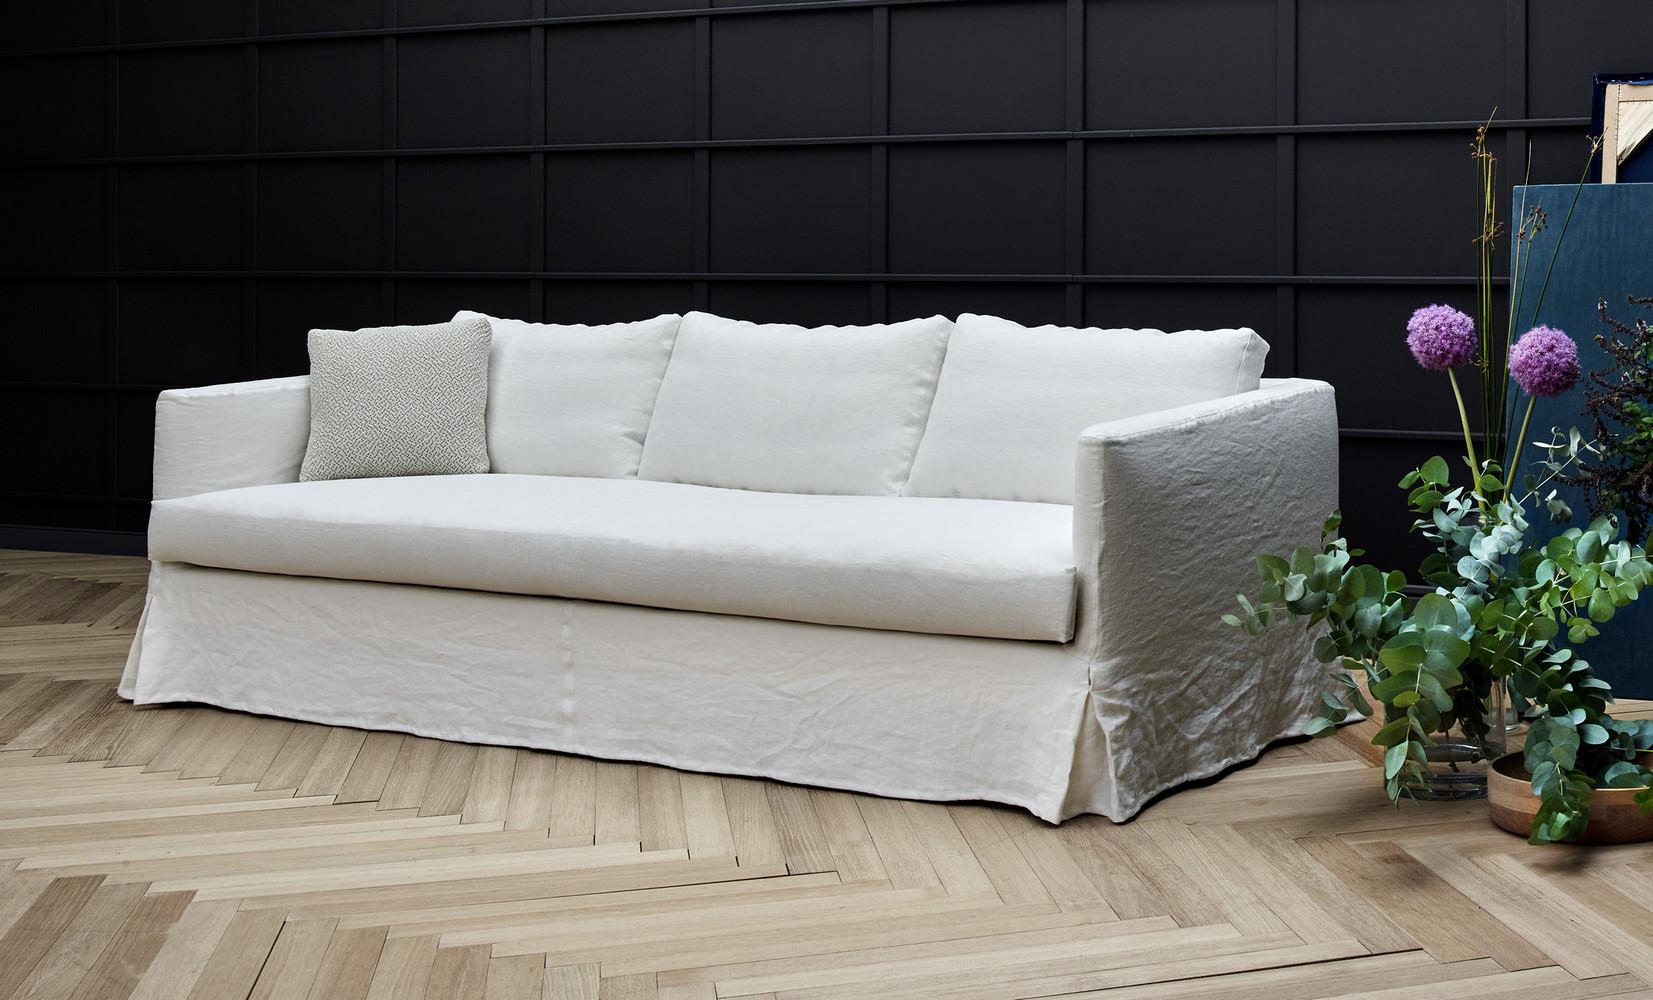 Sof y sill n joquer mod venice fald n muebles pulido - Outlet muebles hogar y decoracion madrid ...